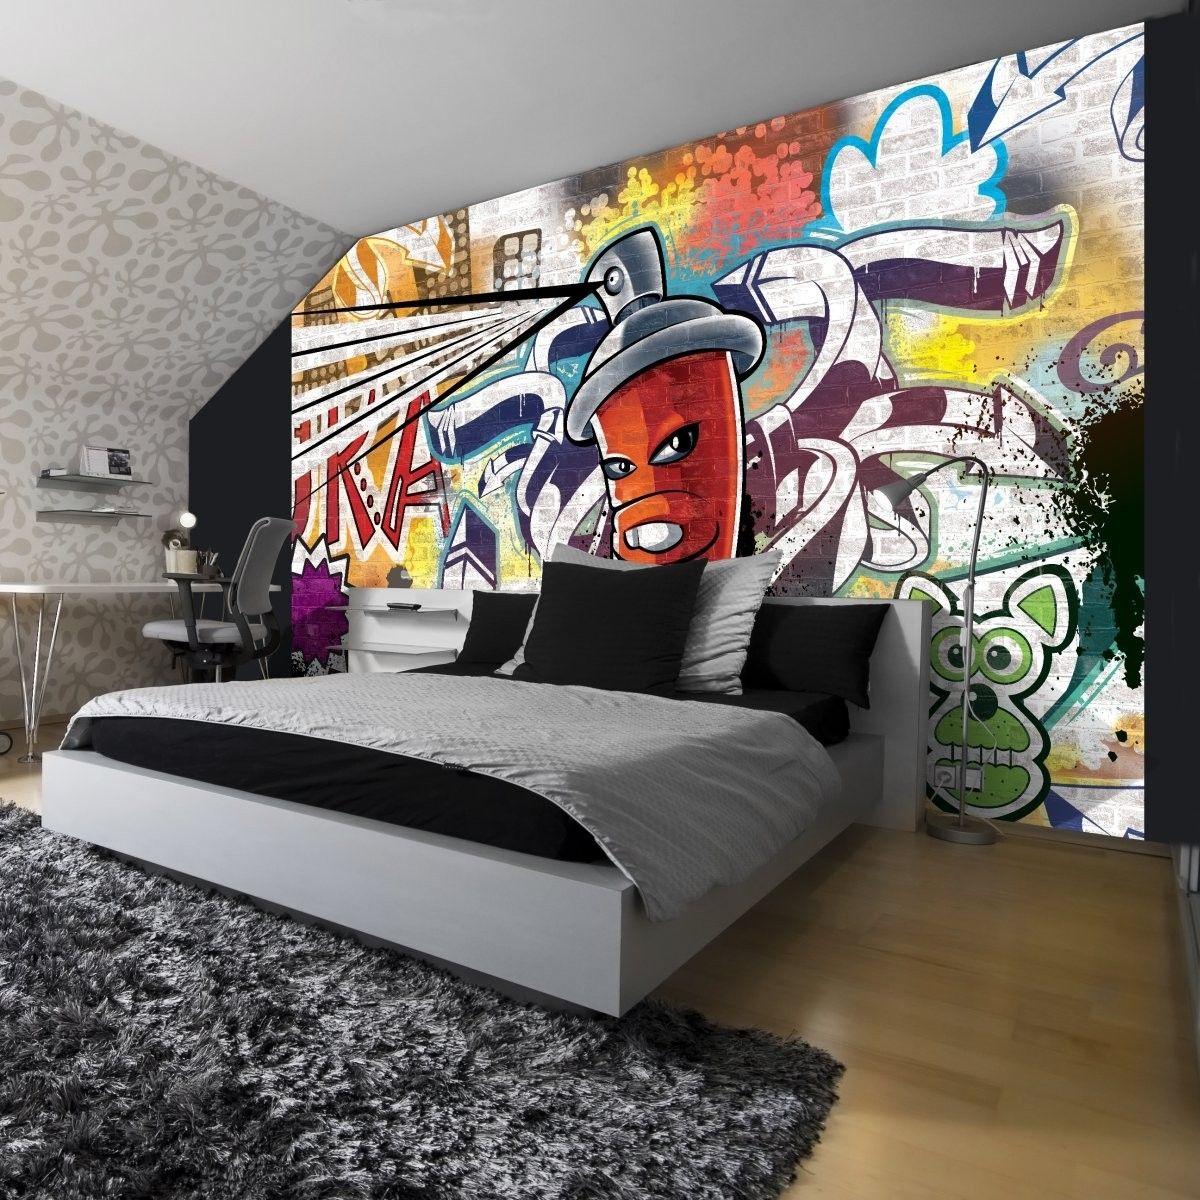 Graffiti Fotobehang - Graffiti, Fotobehang en Slaapkamer